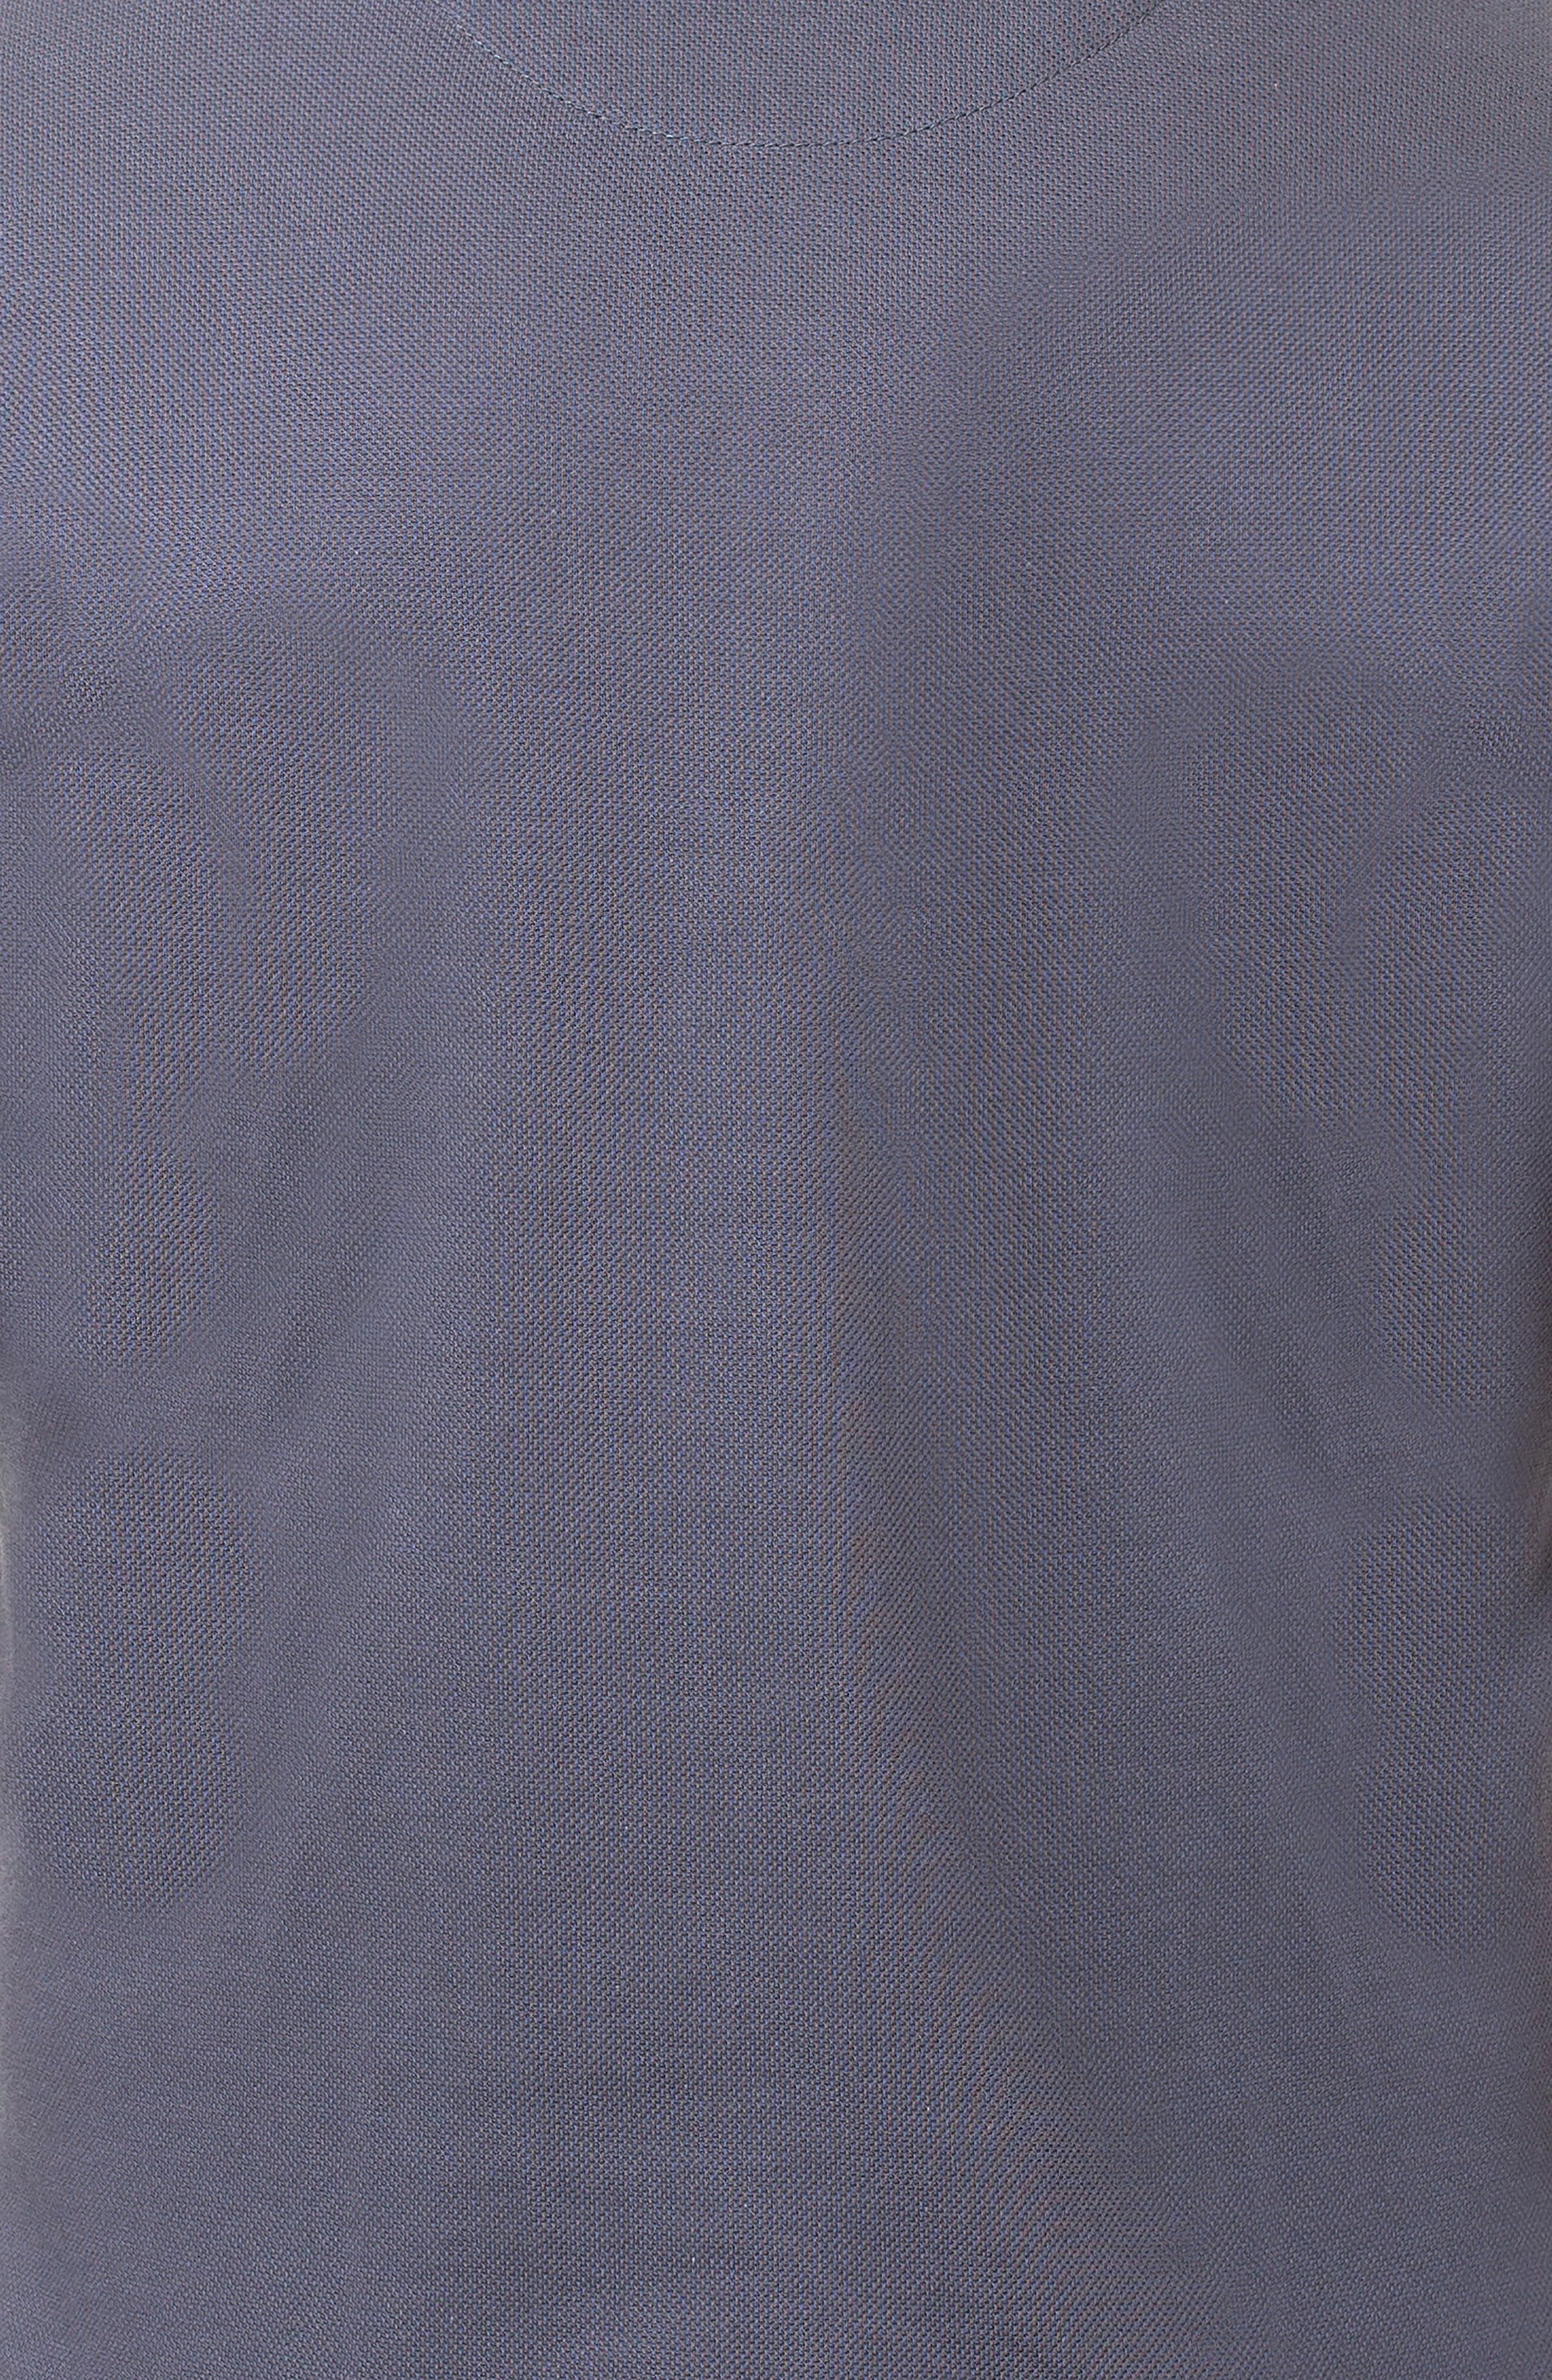 Woven Trim Polo,                             Alternate thumbnail 3, color,                             030